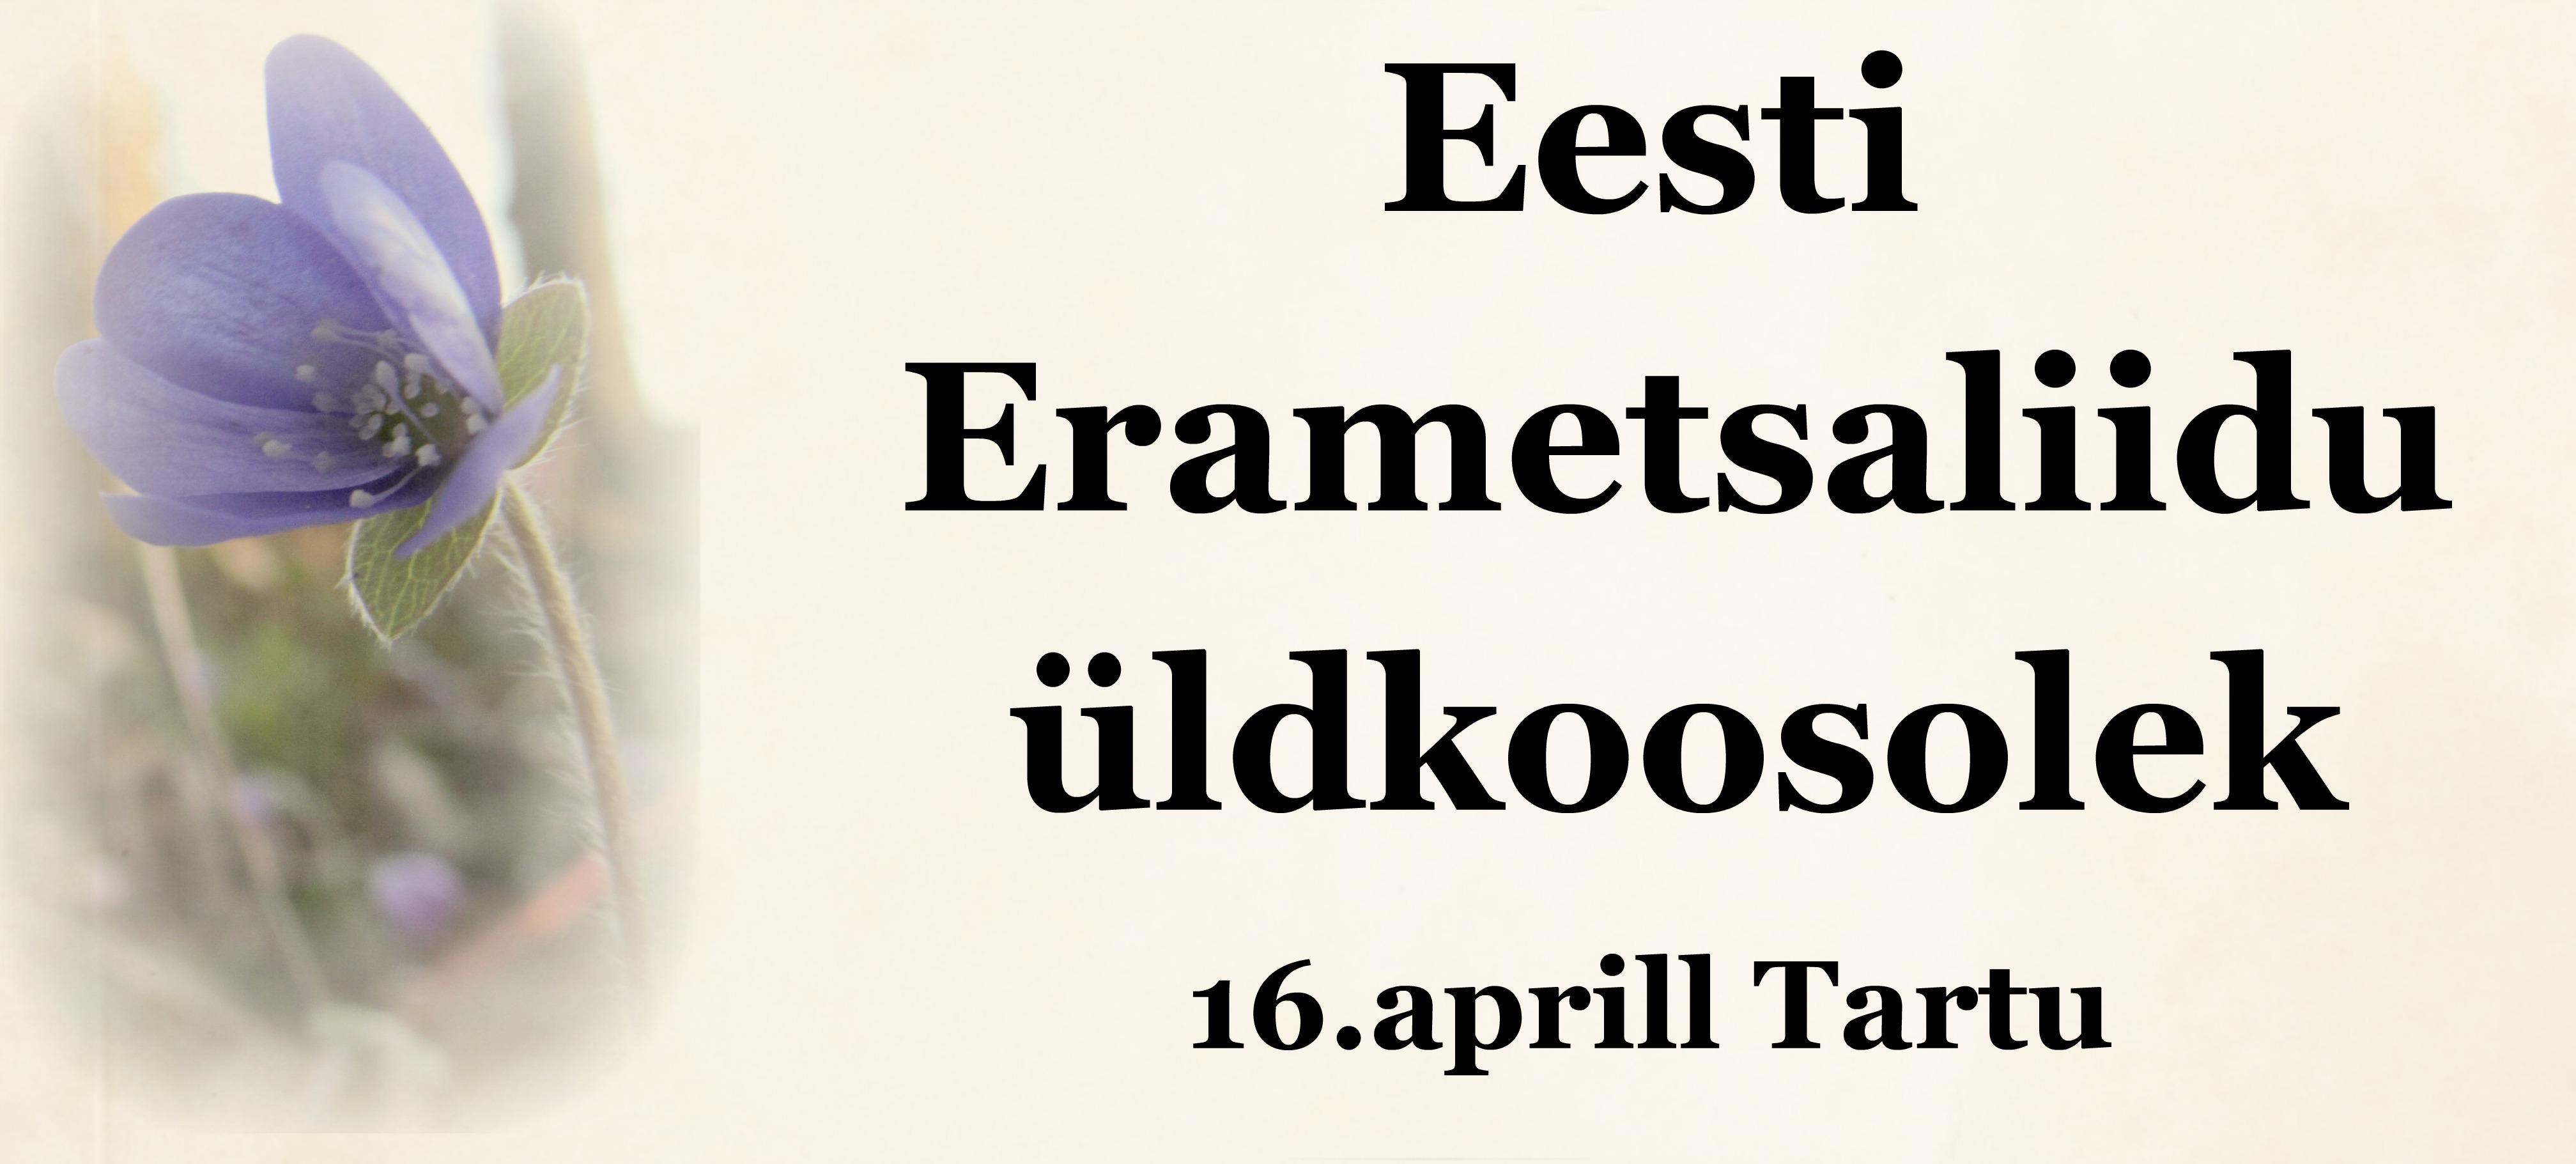 http://vana.erametsaliit.ee/eesti-erametsaliidu-uldkoosolek/